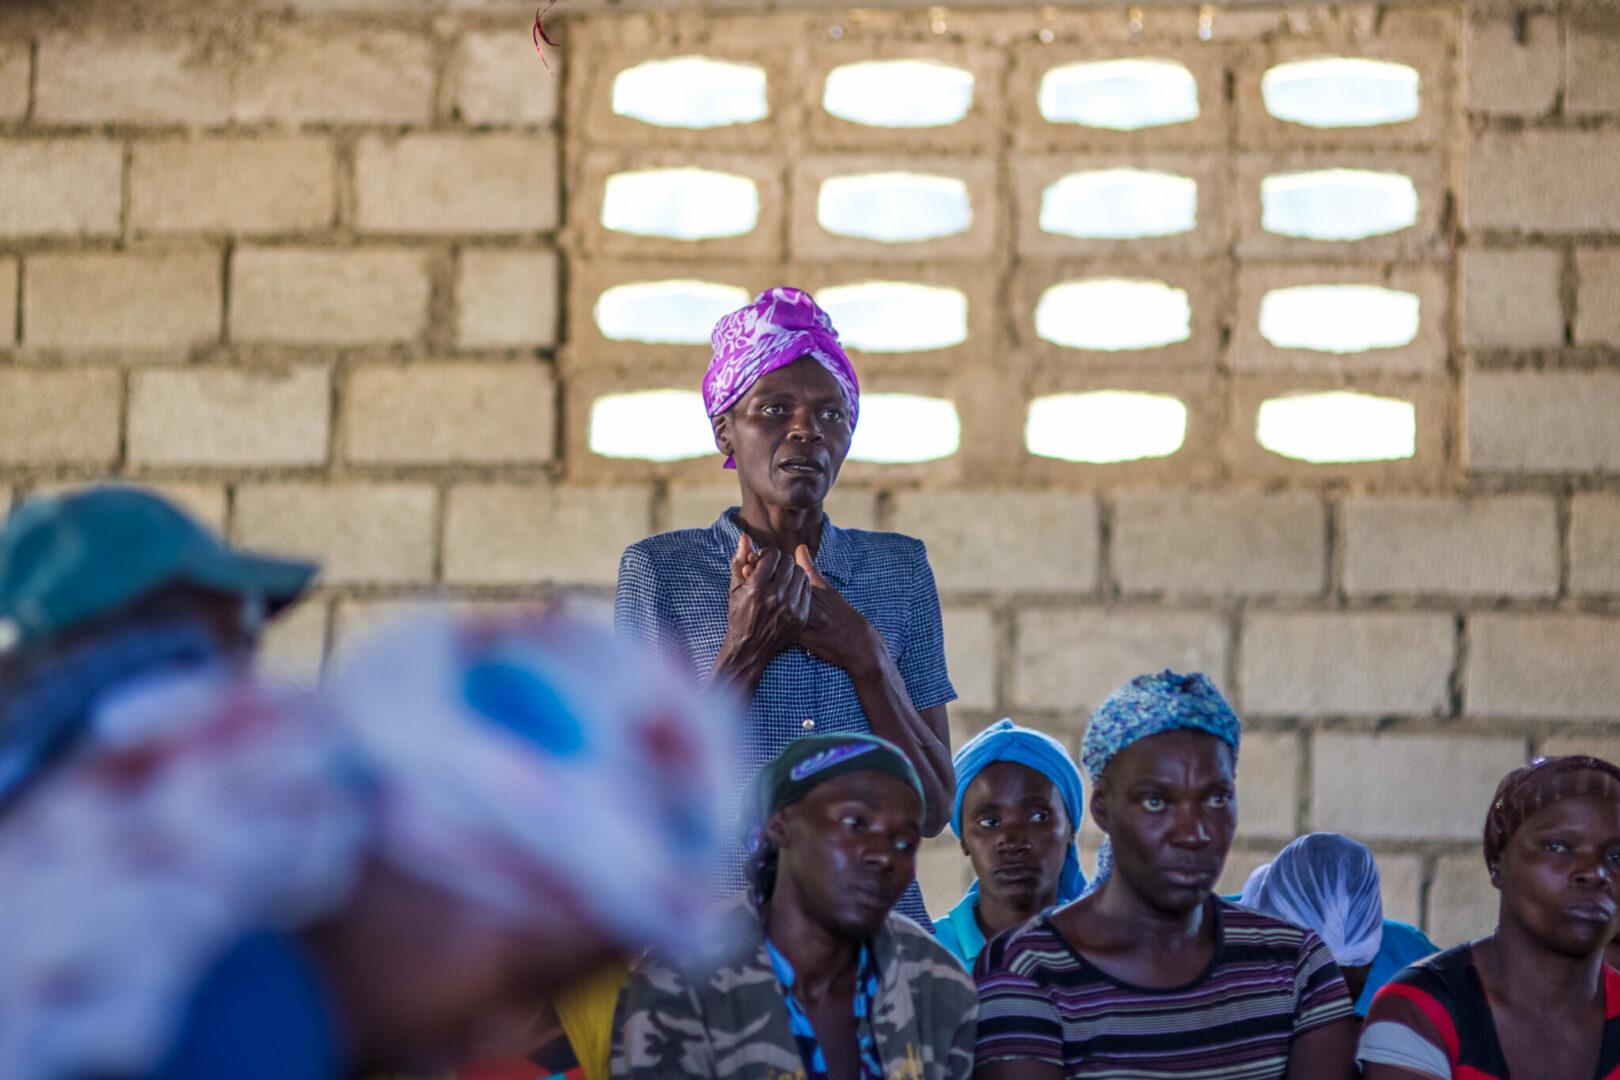 A savings group member proposes a loan.